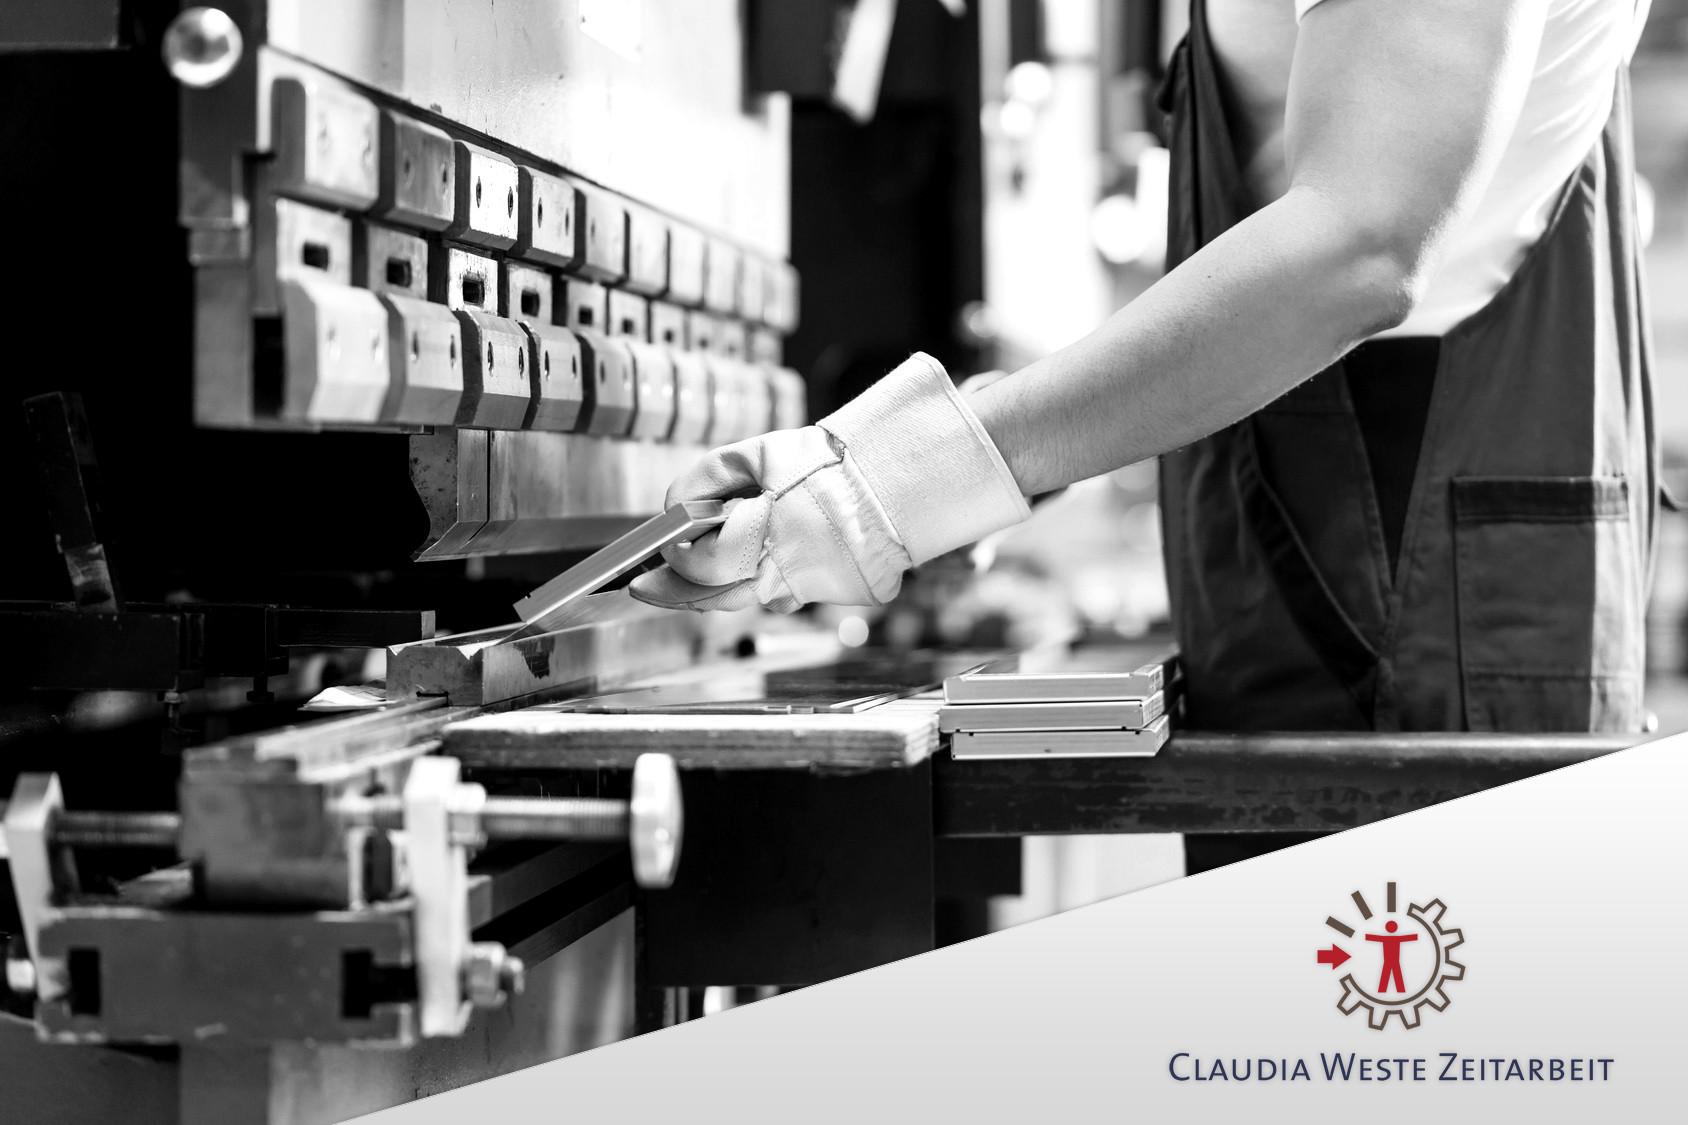 Claudia Weste Zeitarbeit GmbH